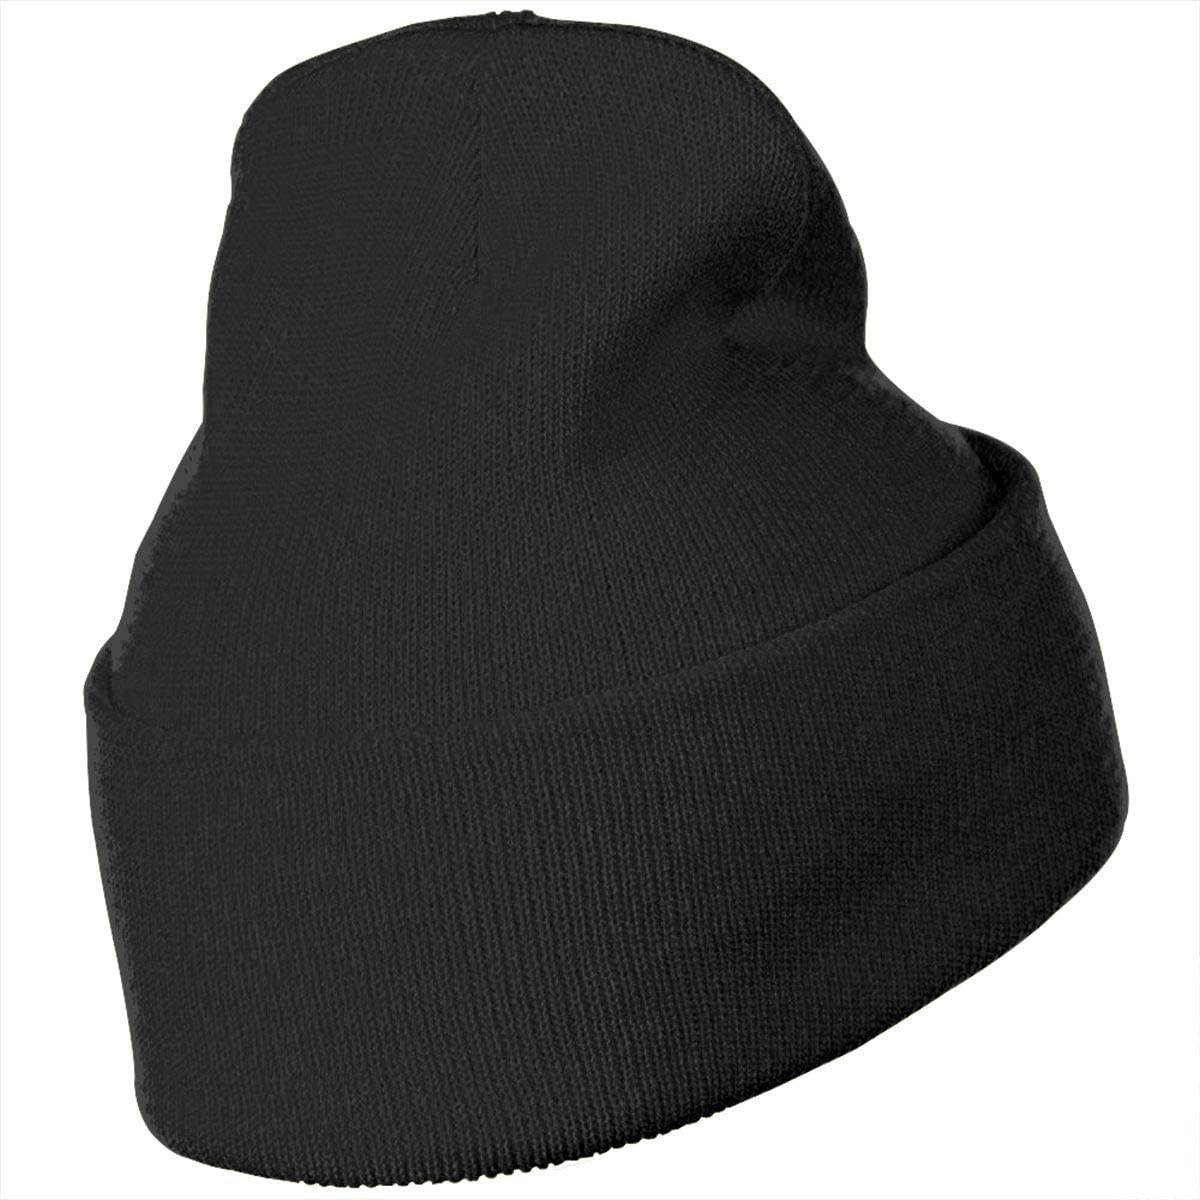 COLLJL-8 Men//Women British American Flag Outdoor Stretch Knit Beanies Hat Soft Winter Skull Caps